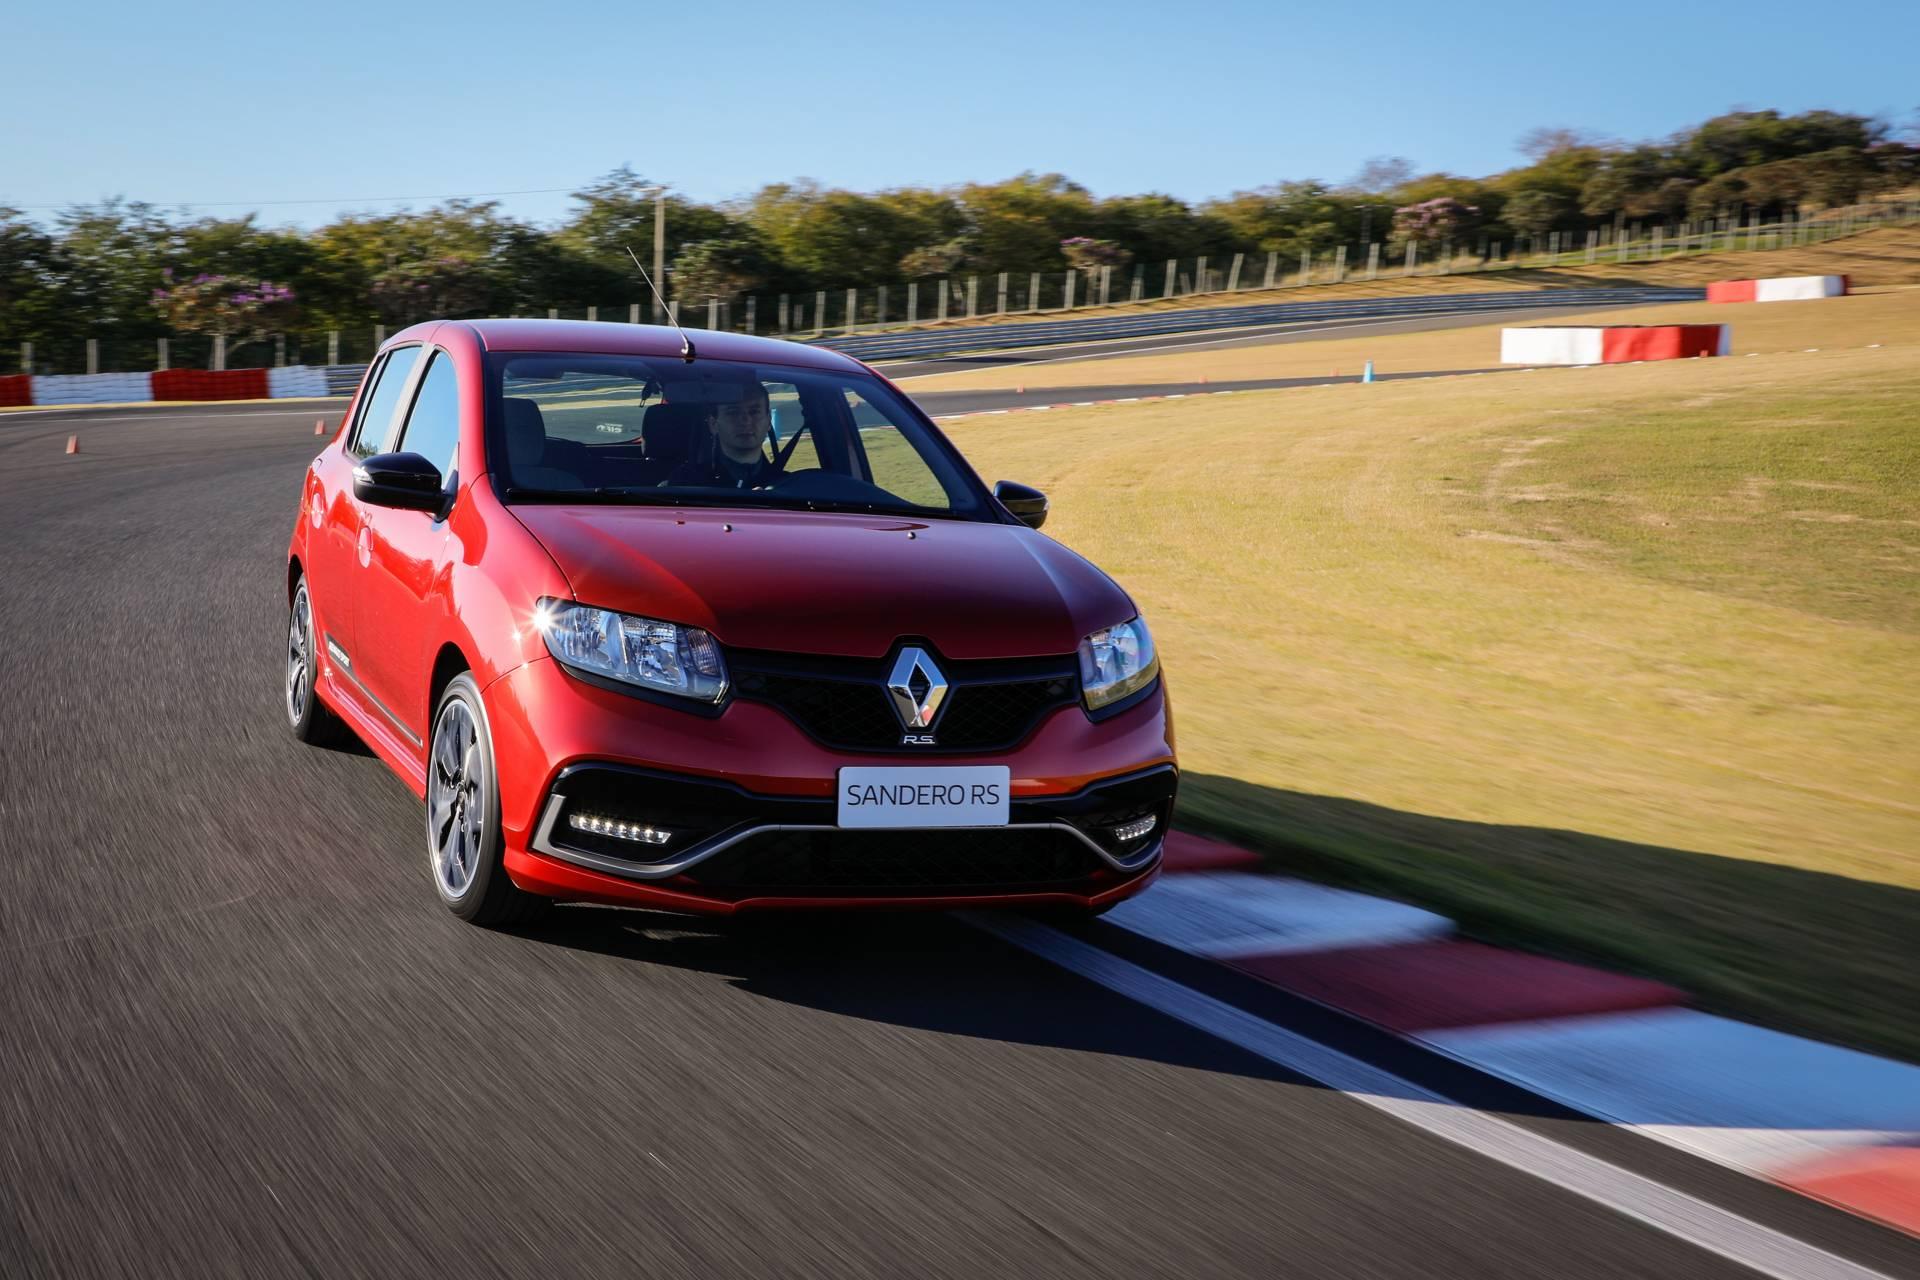 2020_Renault_Sandero_RS_facelift_0008